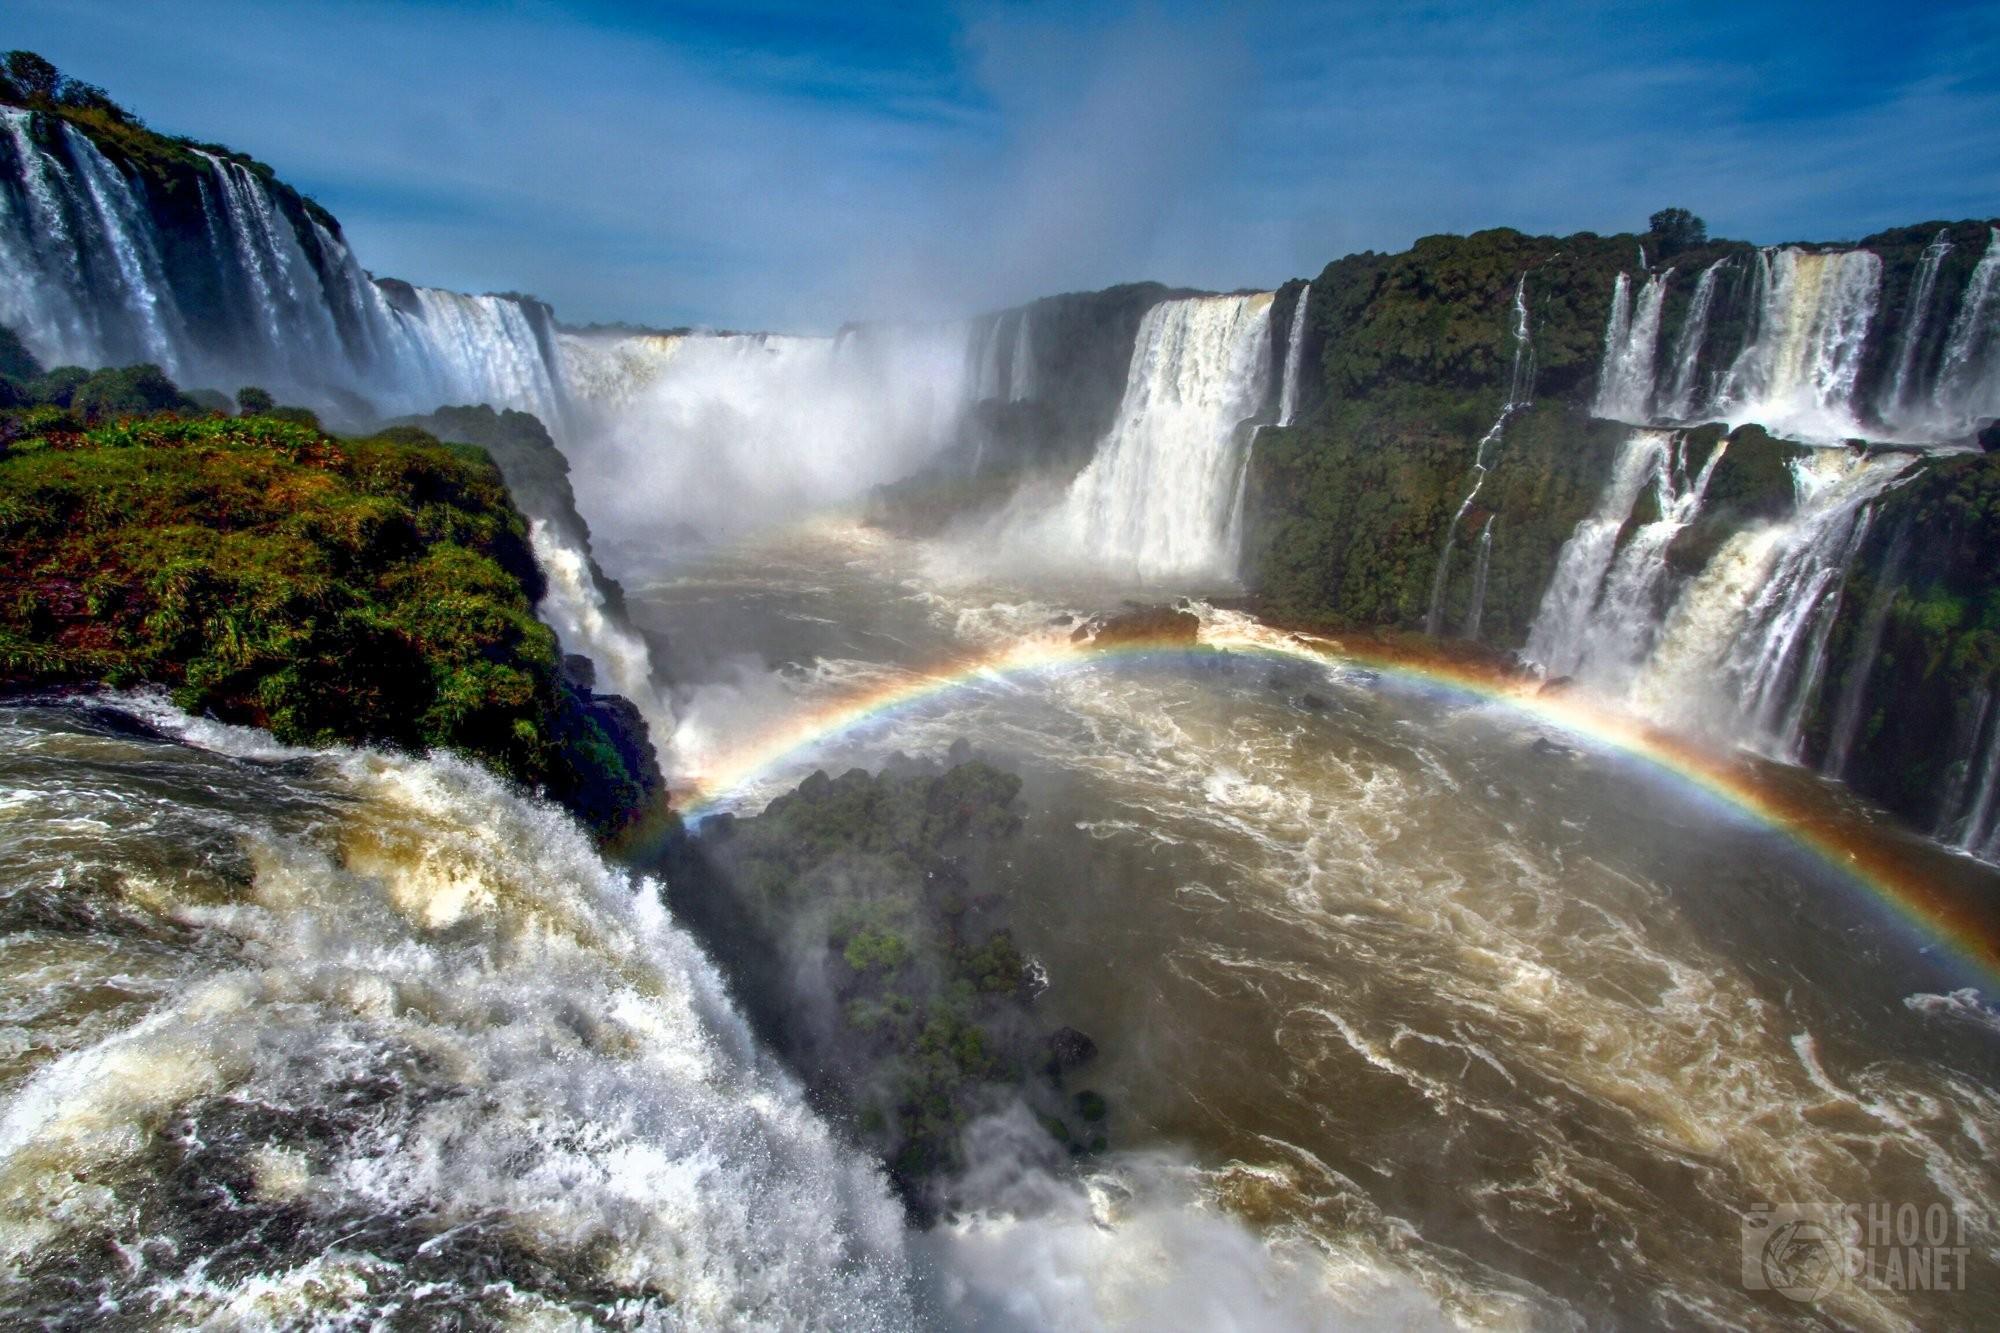 Iguazu Falls cataracts and rainbow, Brazil